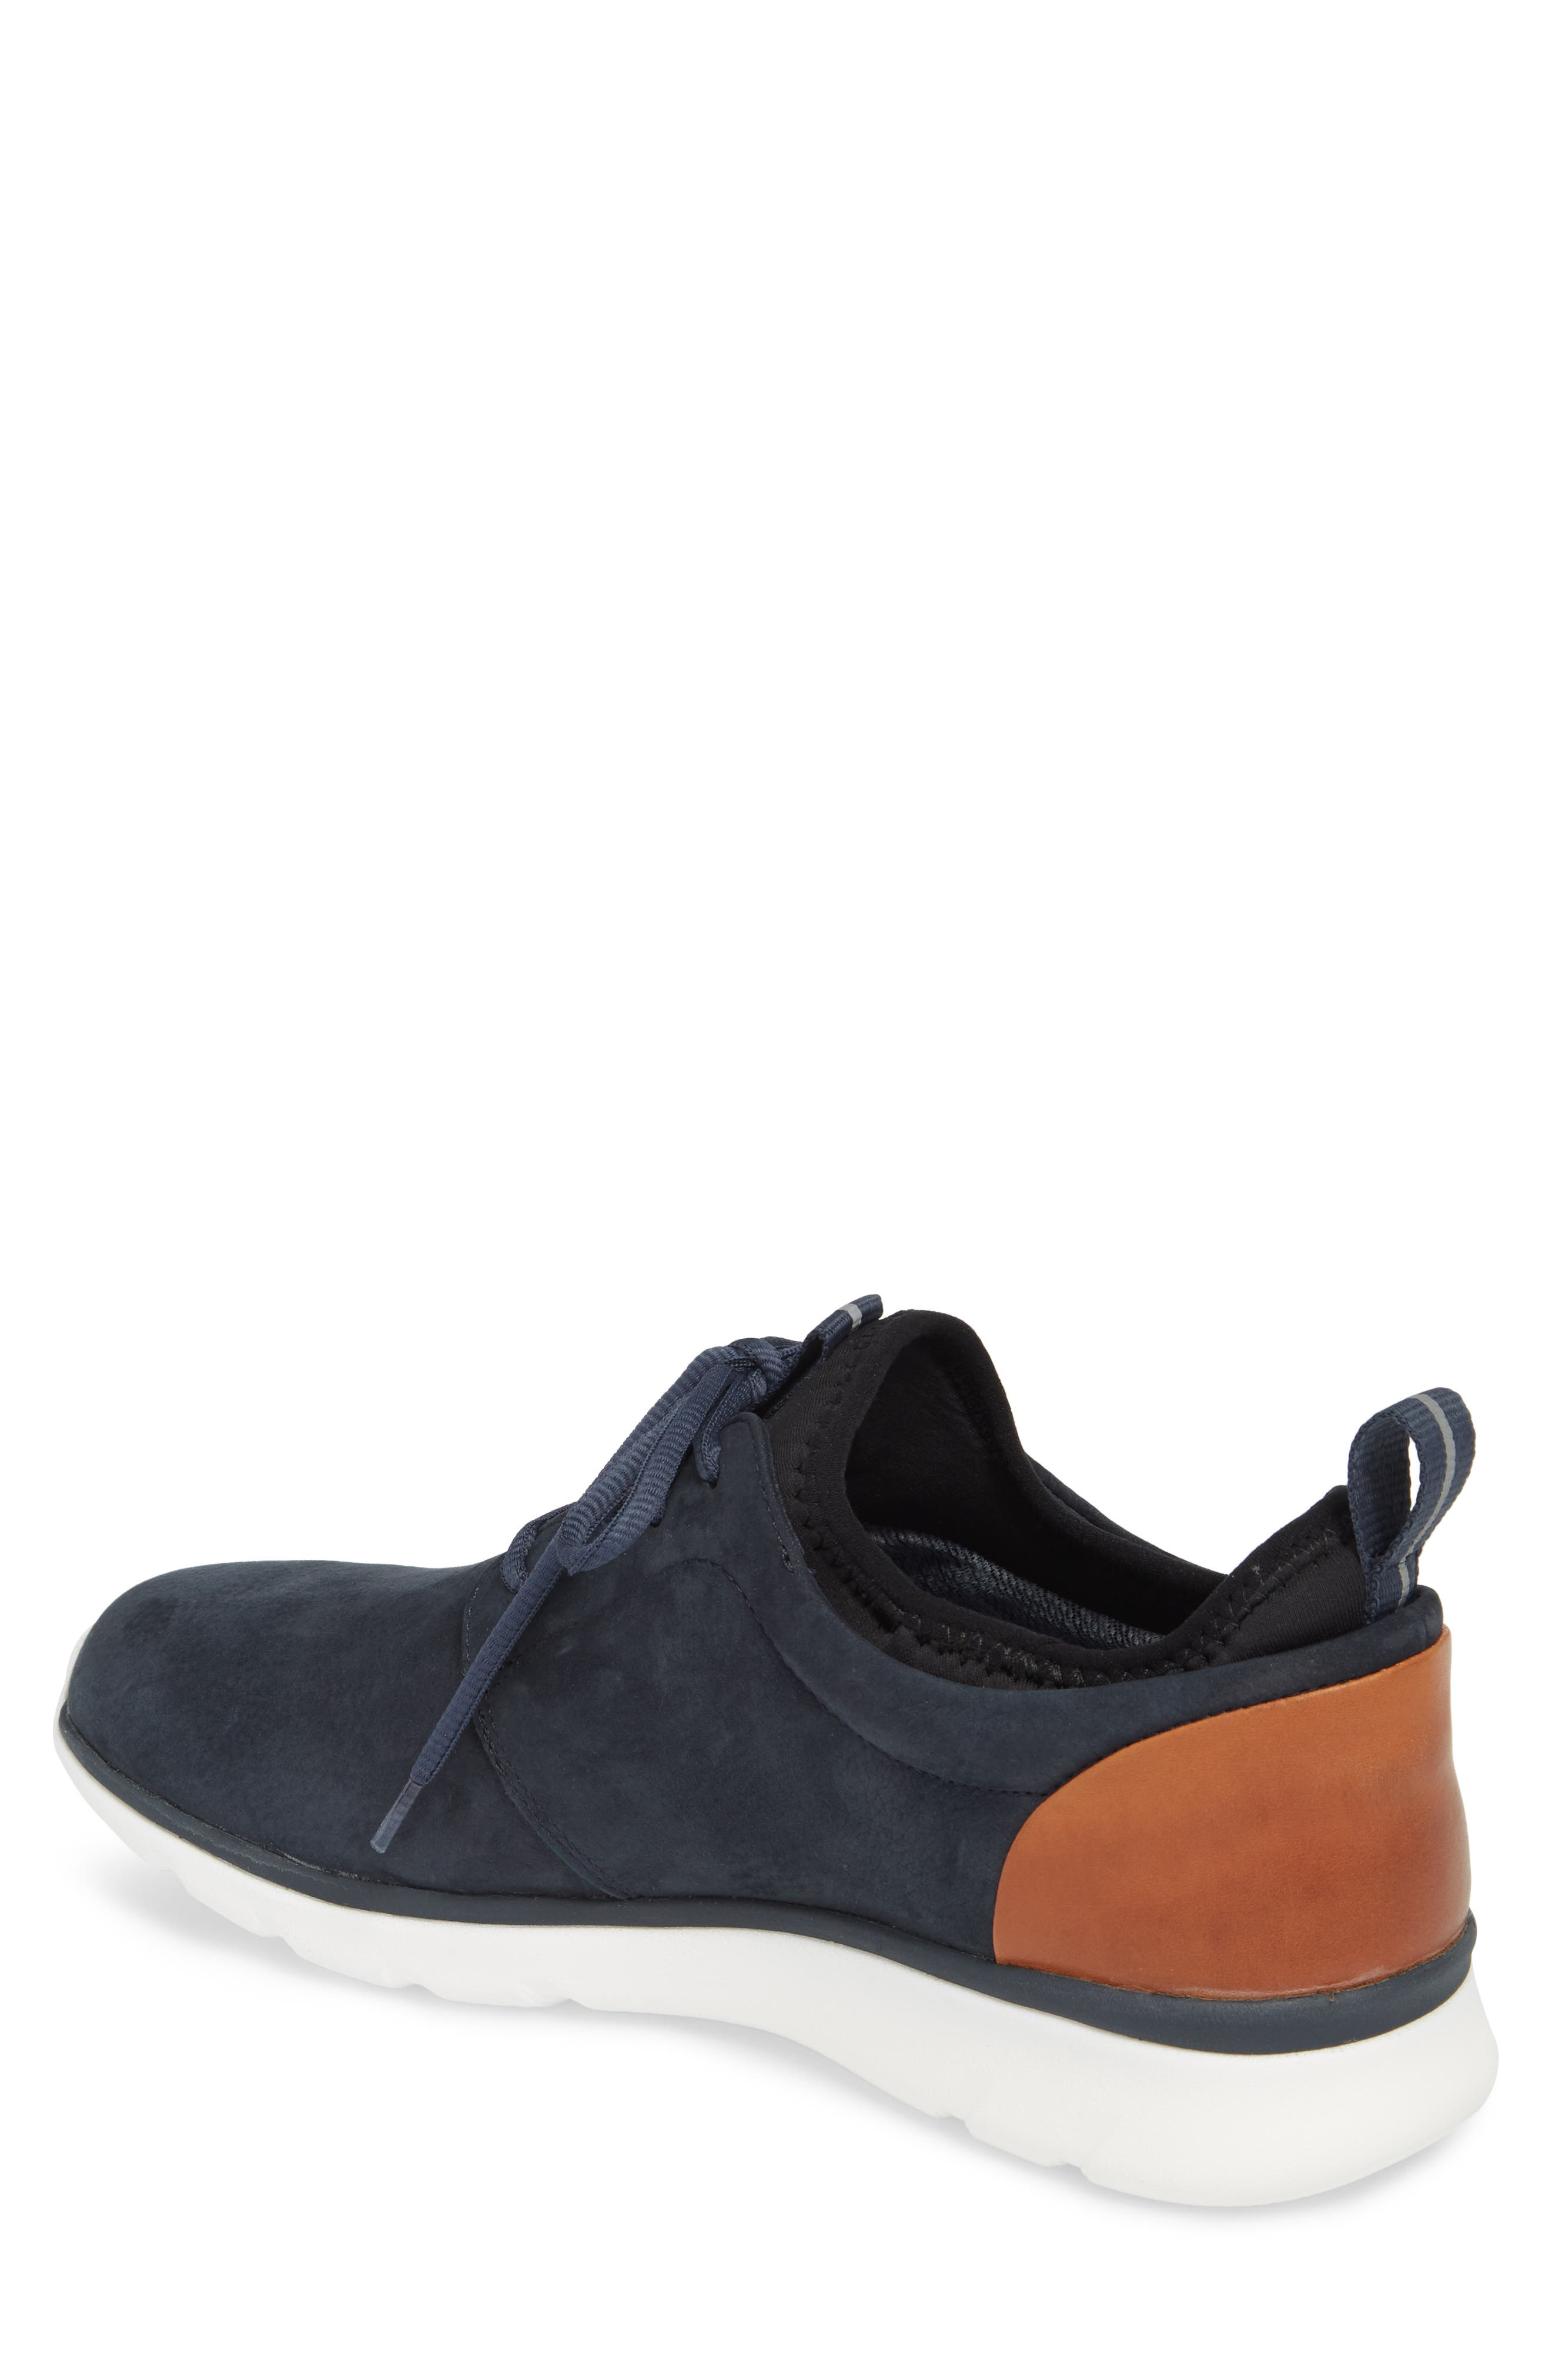 Prentiss XC4<sup>®</sup> Waterproof Low Top Sneaker,                             Alternate thumbnail 2, color,                             Navy Nubuck